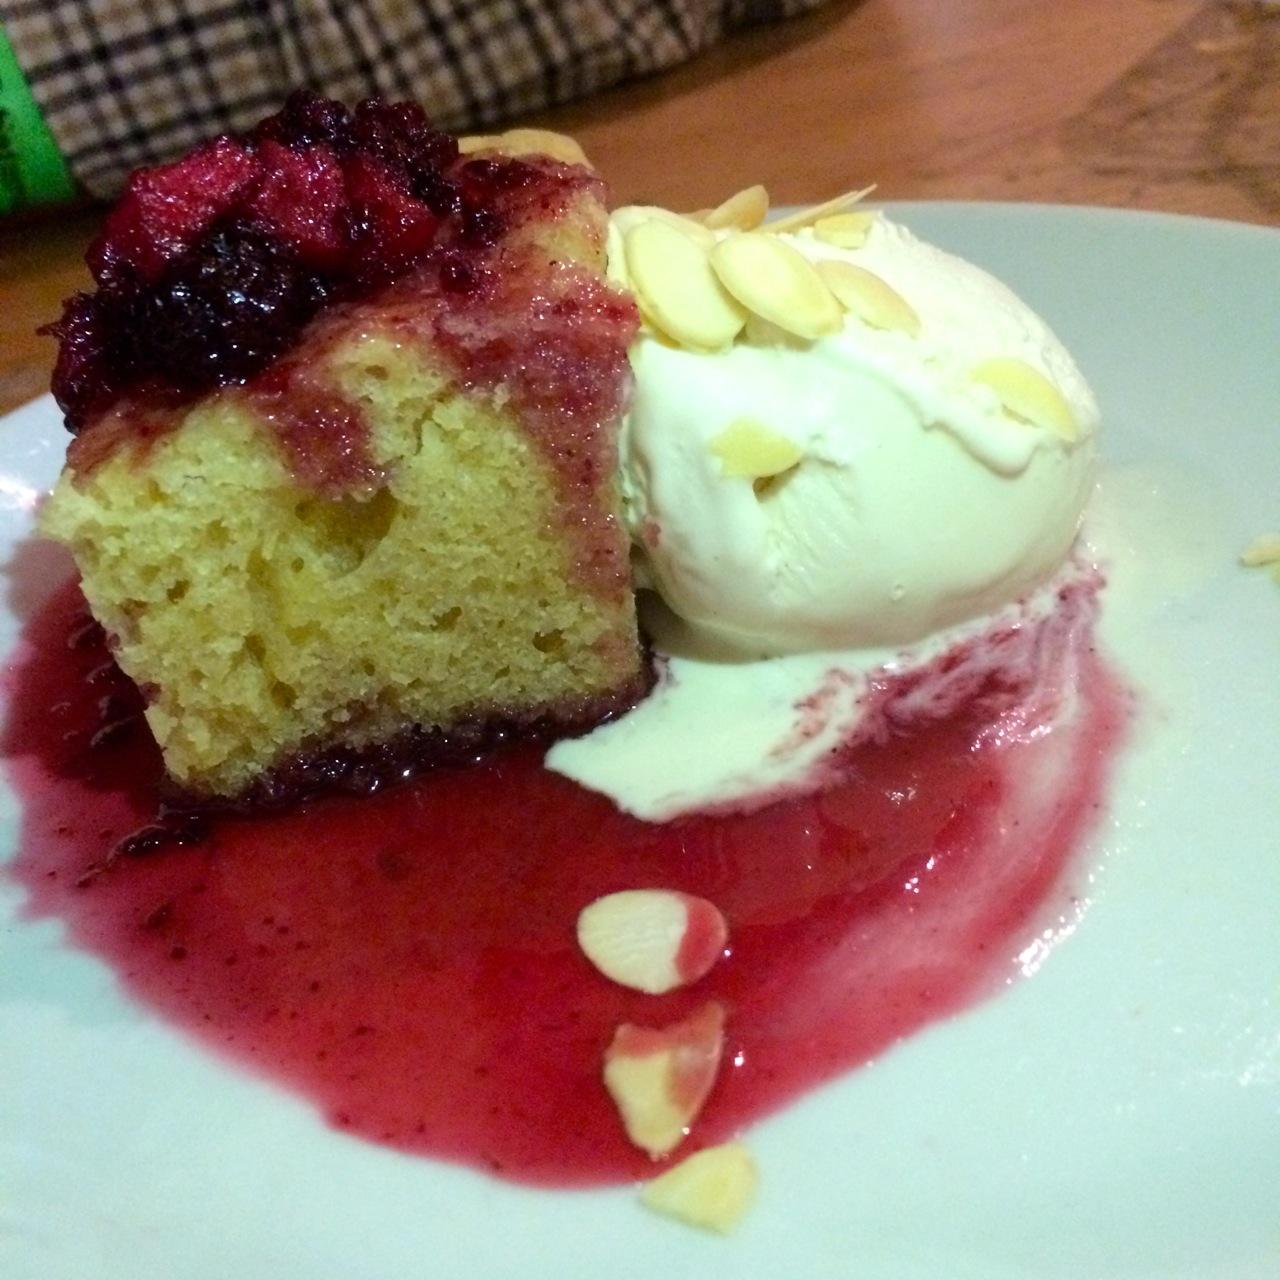 http://i1.wp.com/fatgayvegan.com/wp-content/uploads/2015/12/Bakewell-cake-with-vegan-ice-cream.jpg?fit=1280%2C1280